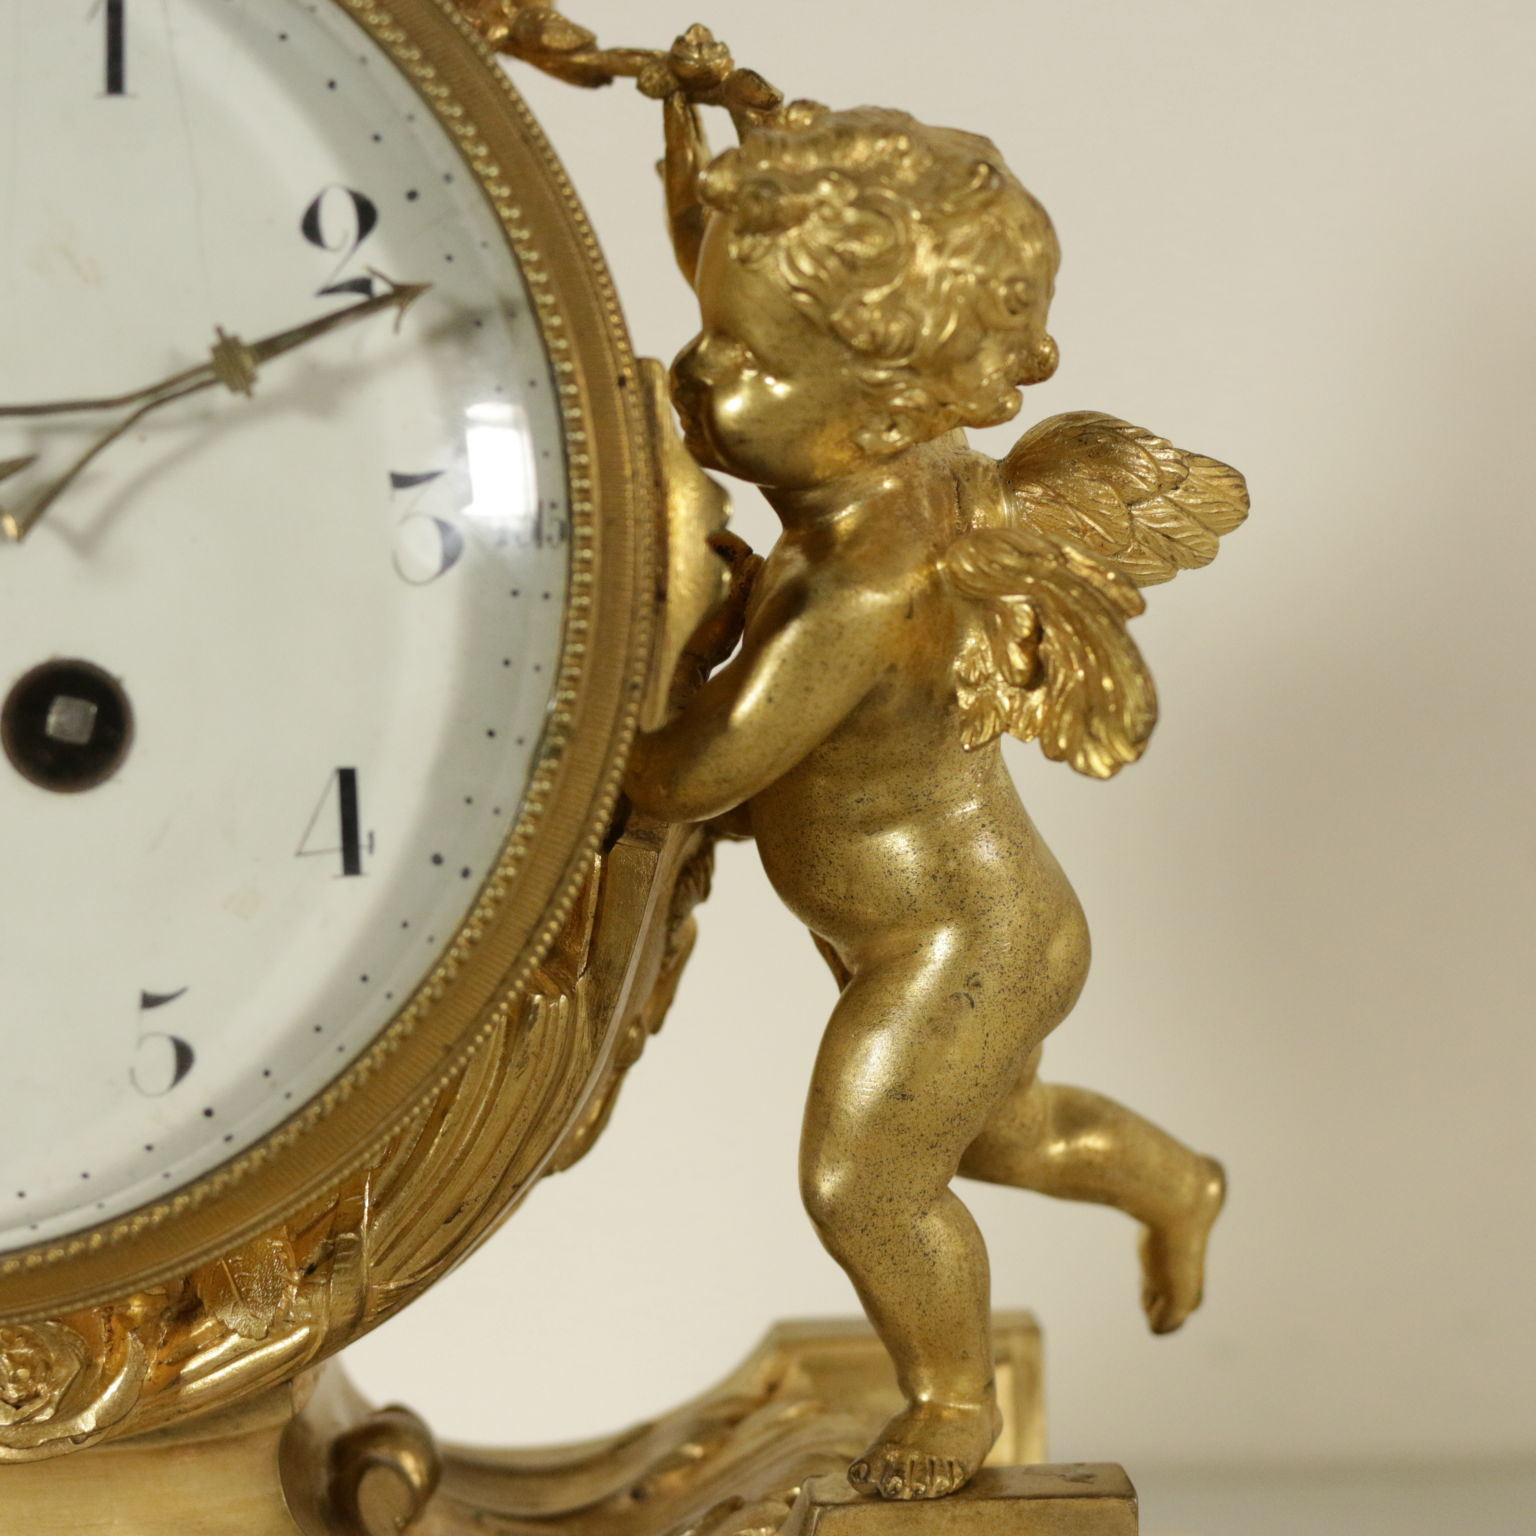 Антикварные часы набросок карандашом